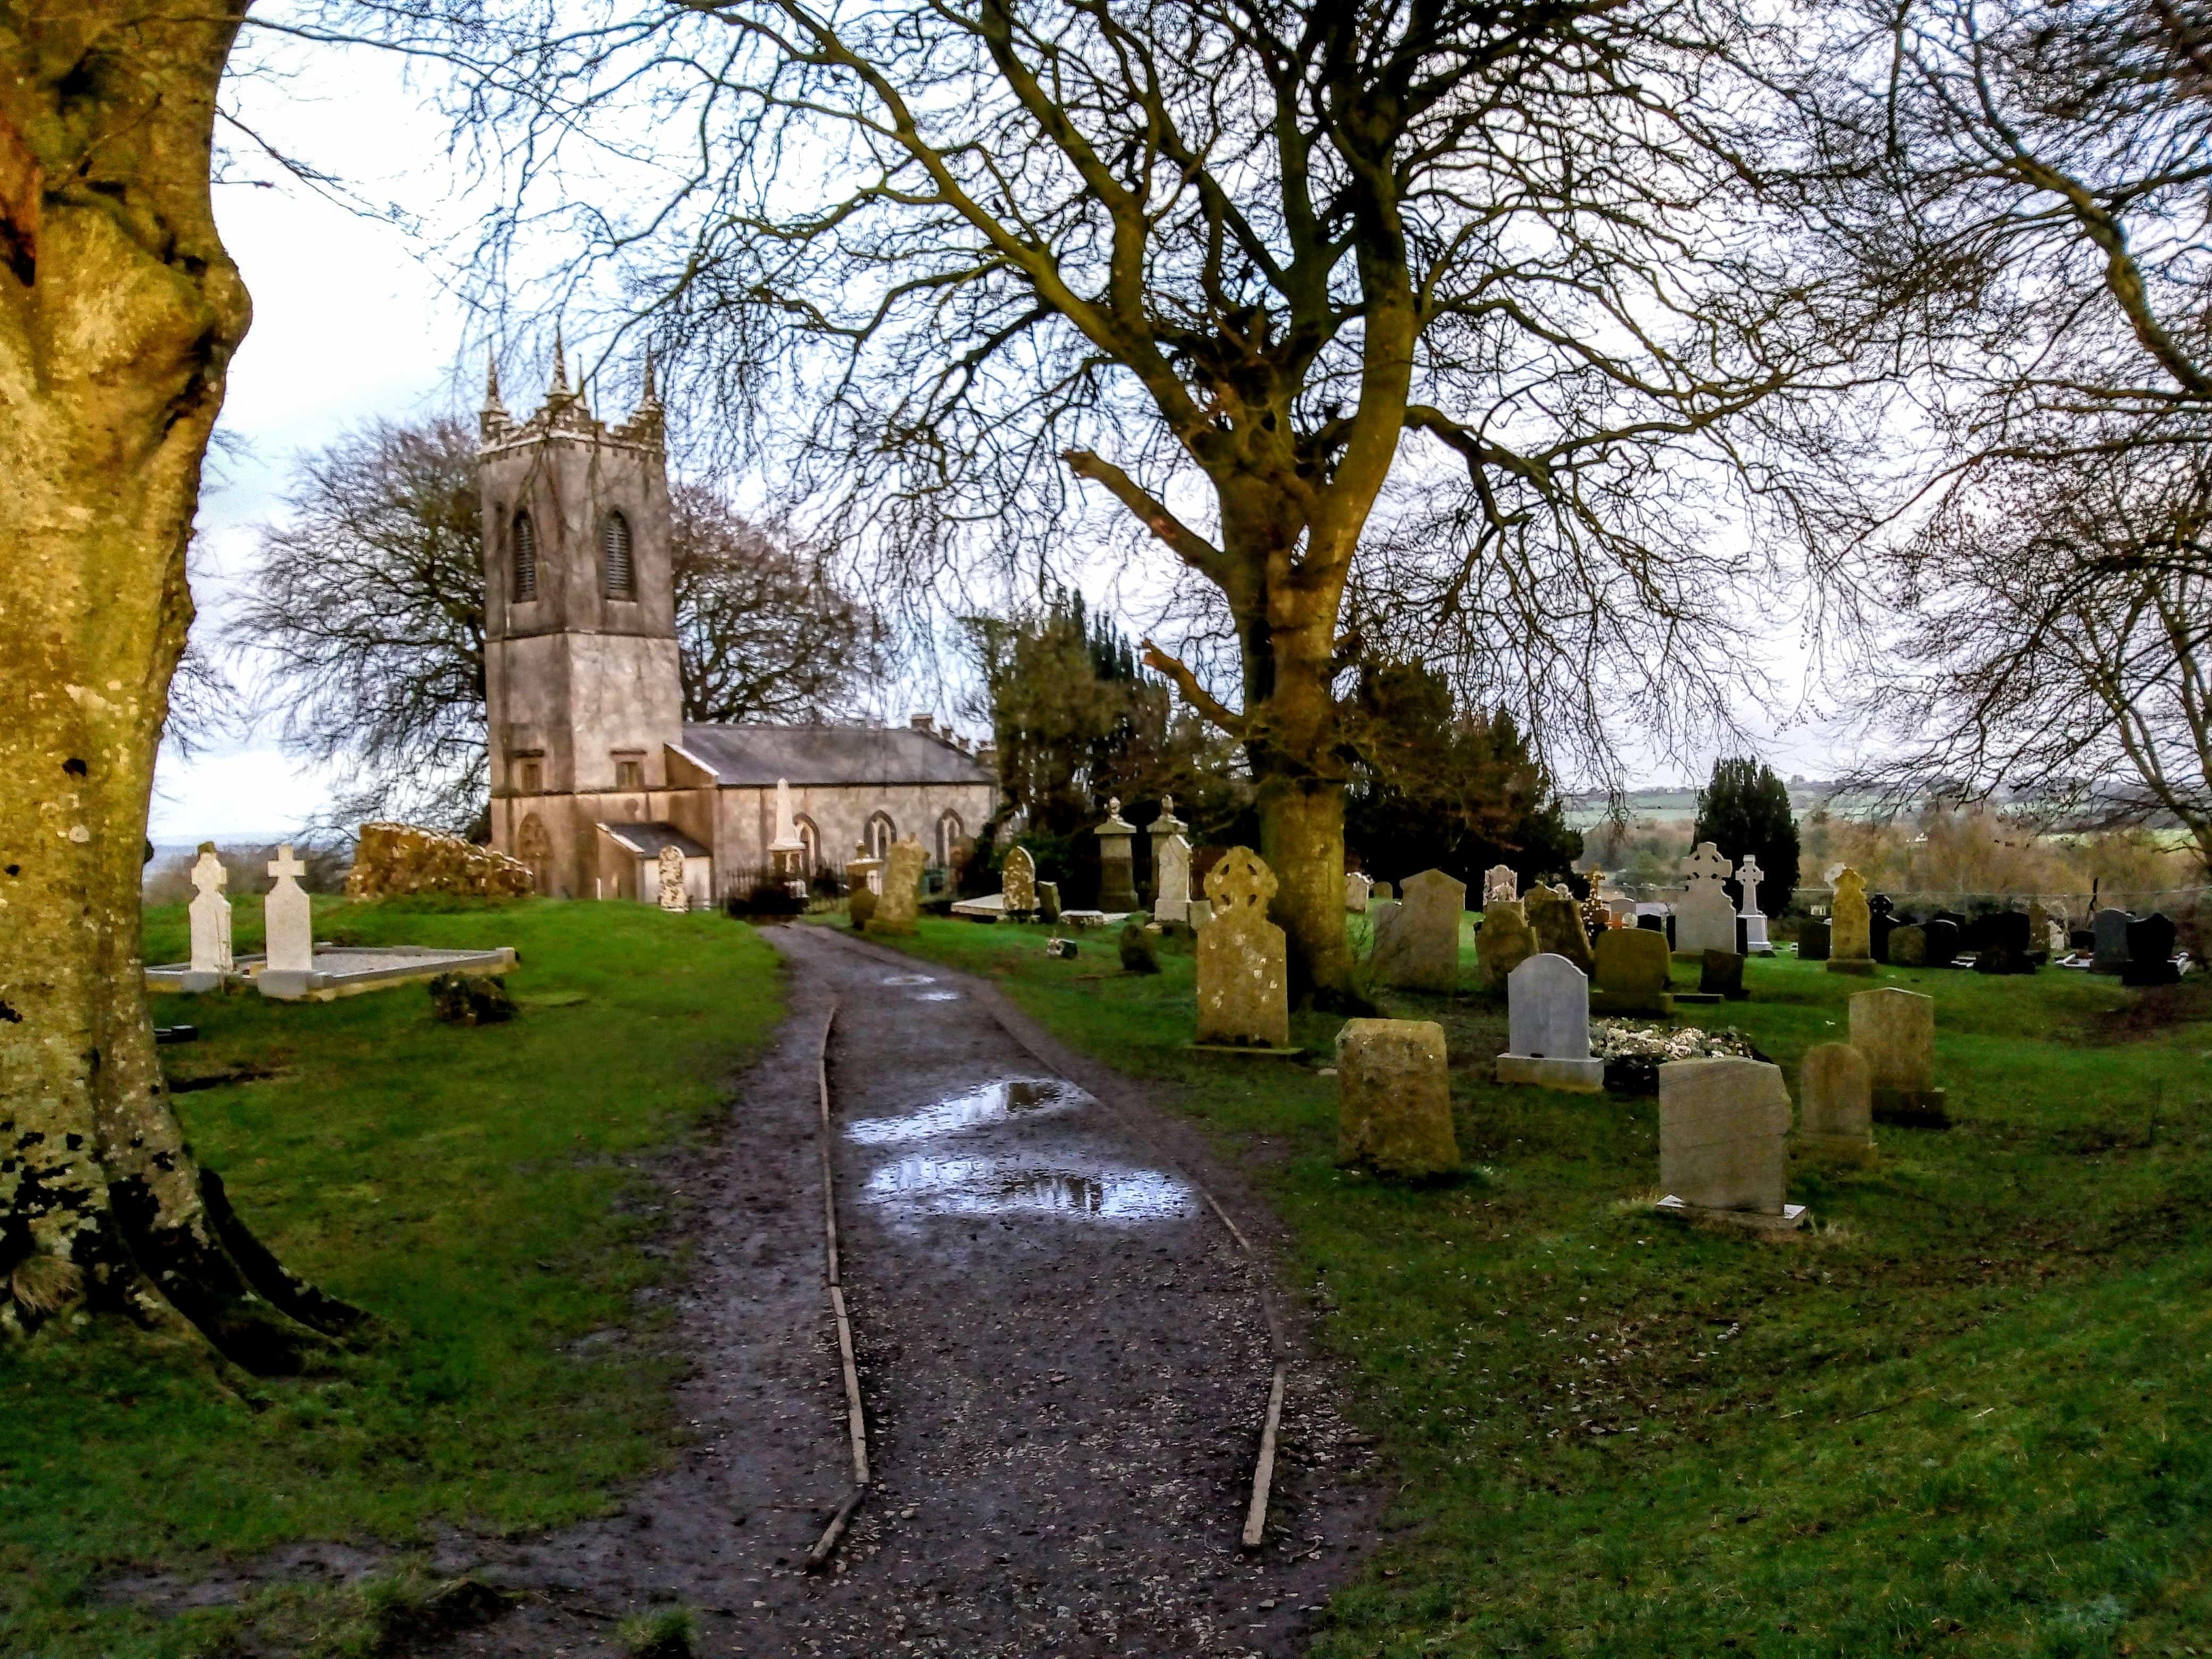 churchyard with standing stones historical sites of ireland Tara